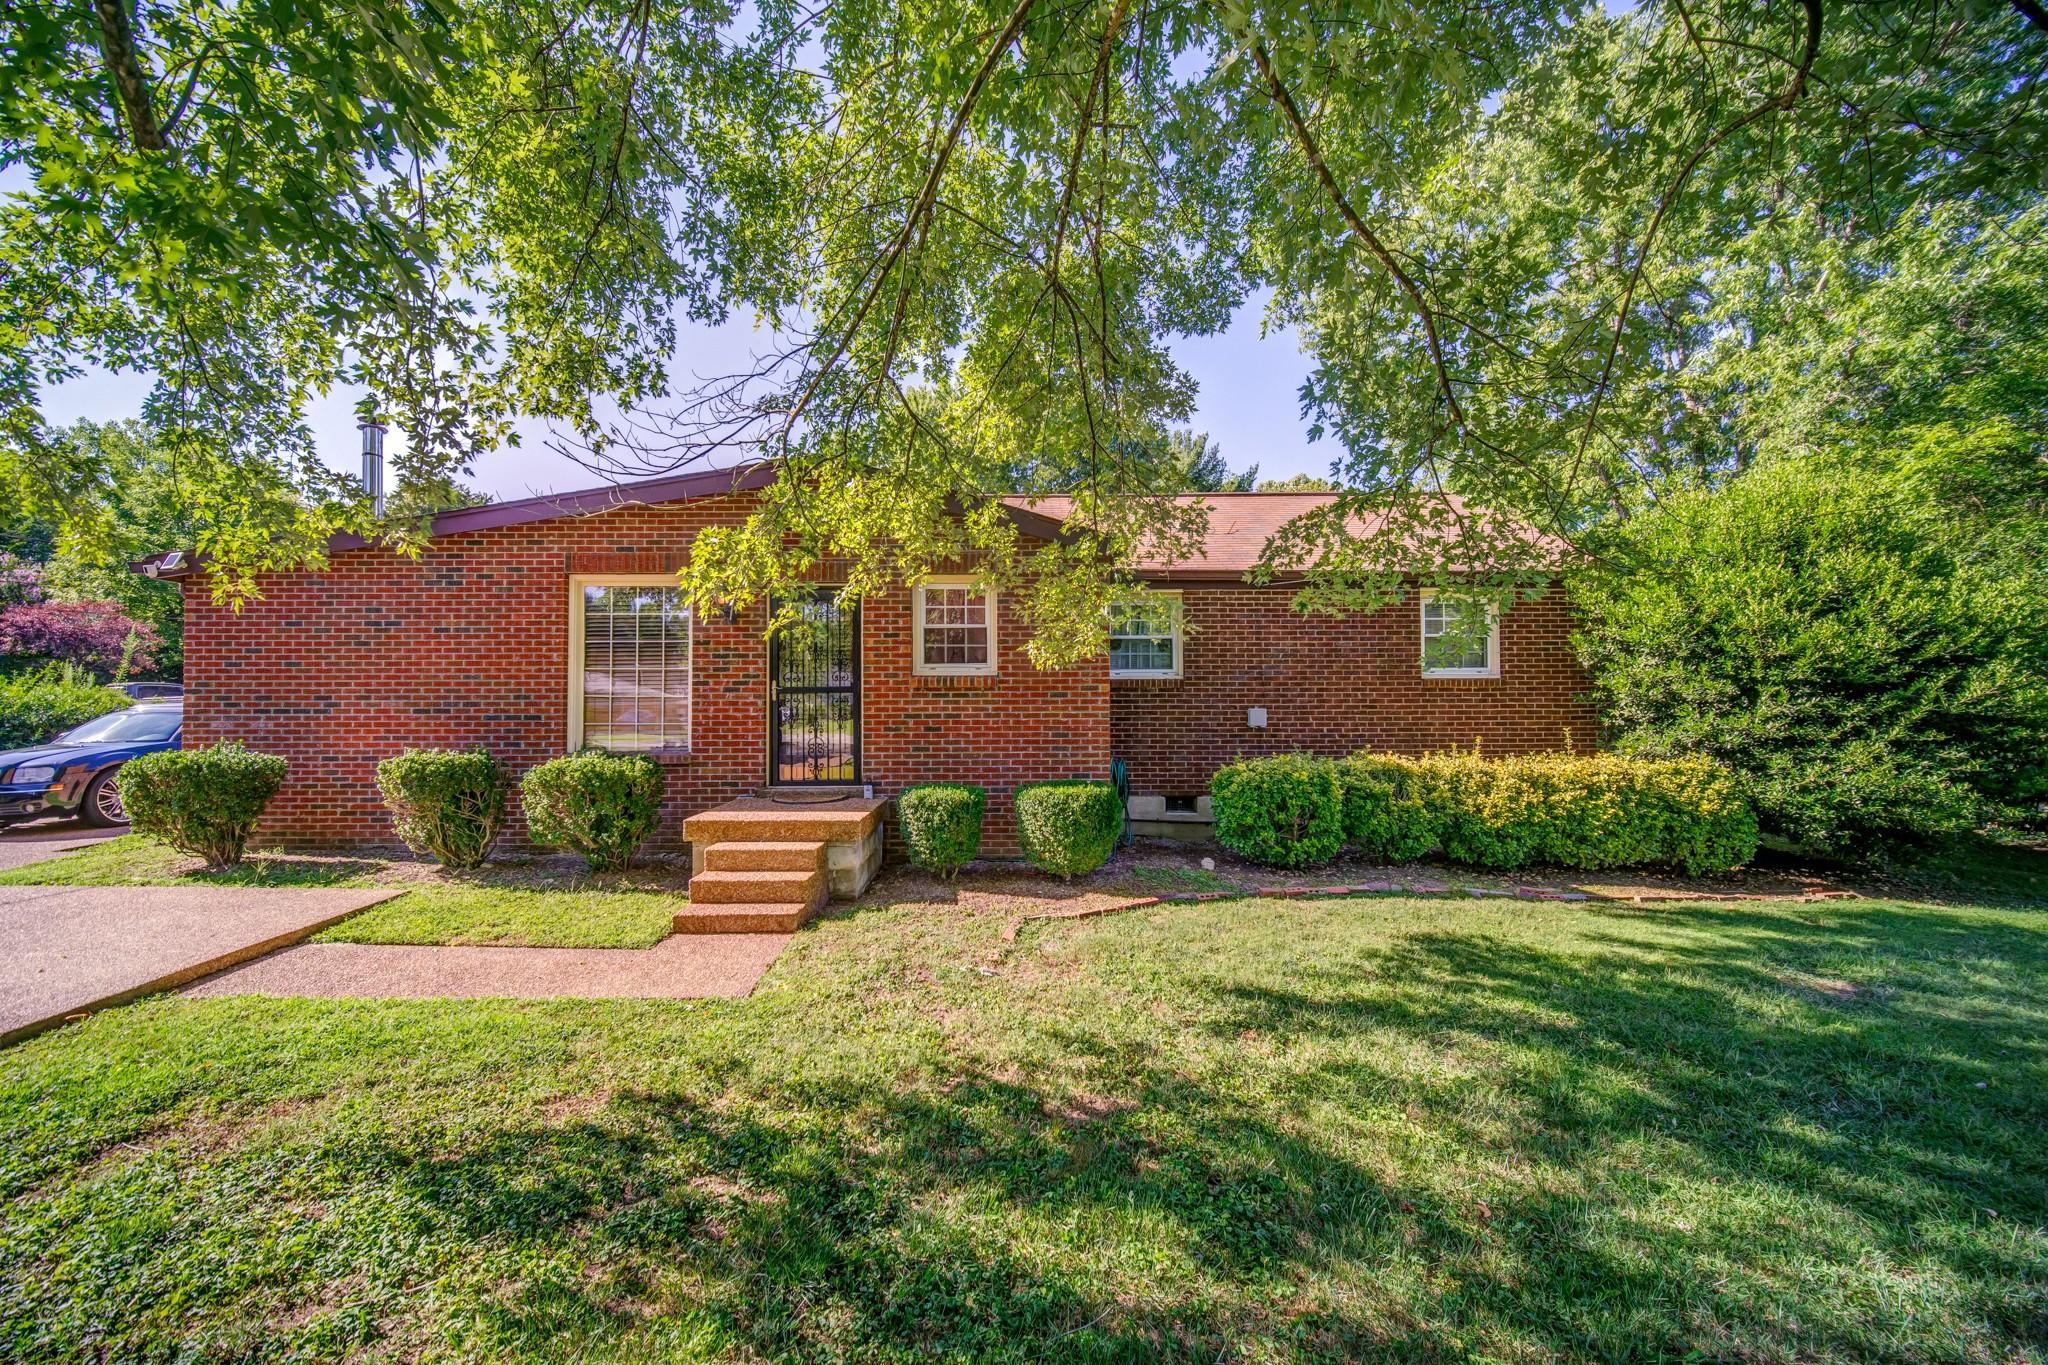 1115 Tuckahoe Dr Property Photo - Nashville, TN real estate listing